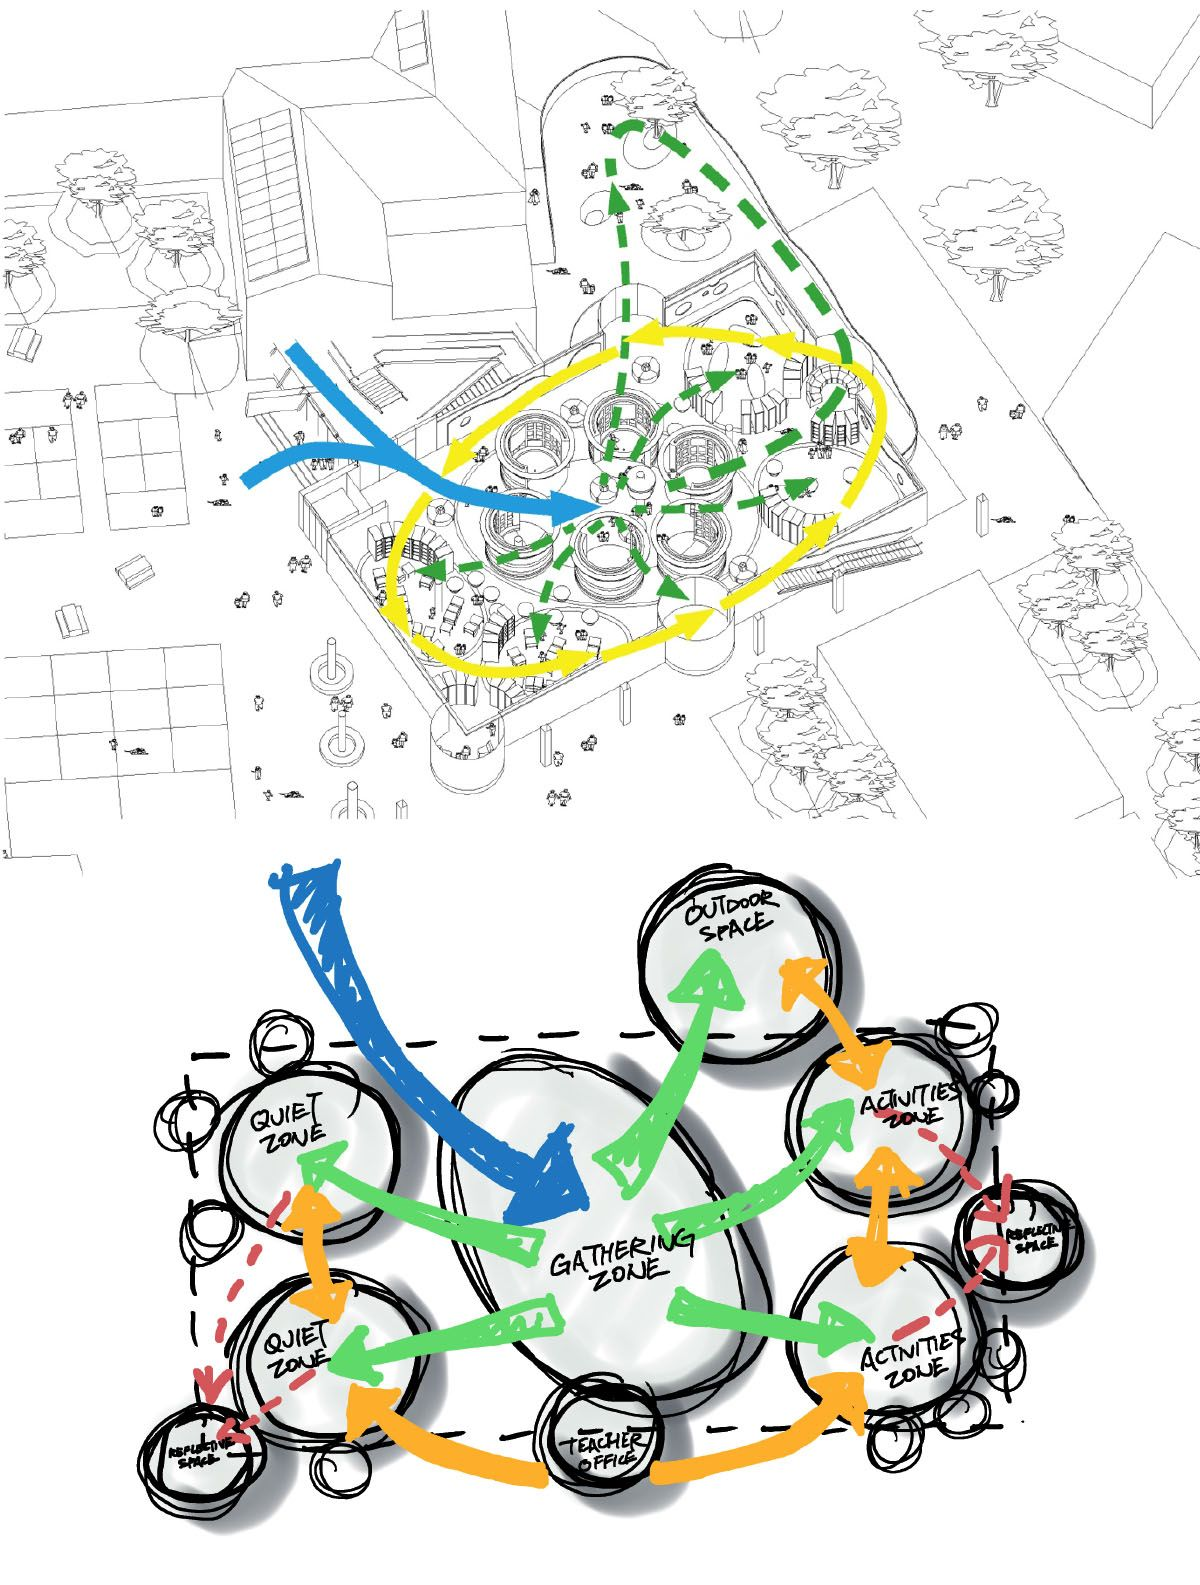 medium resolution of flemington primary school interior design circulation and movement diagrams